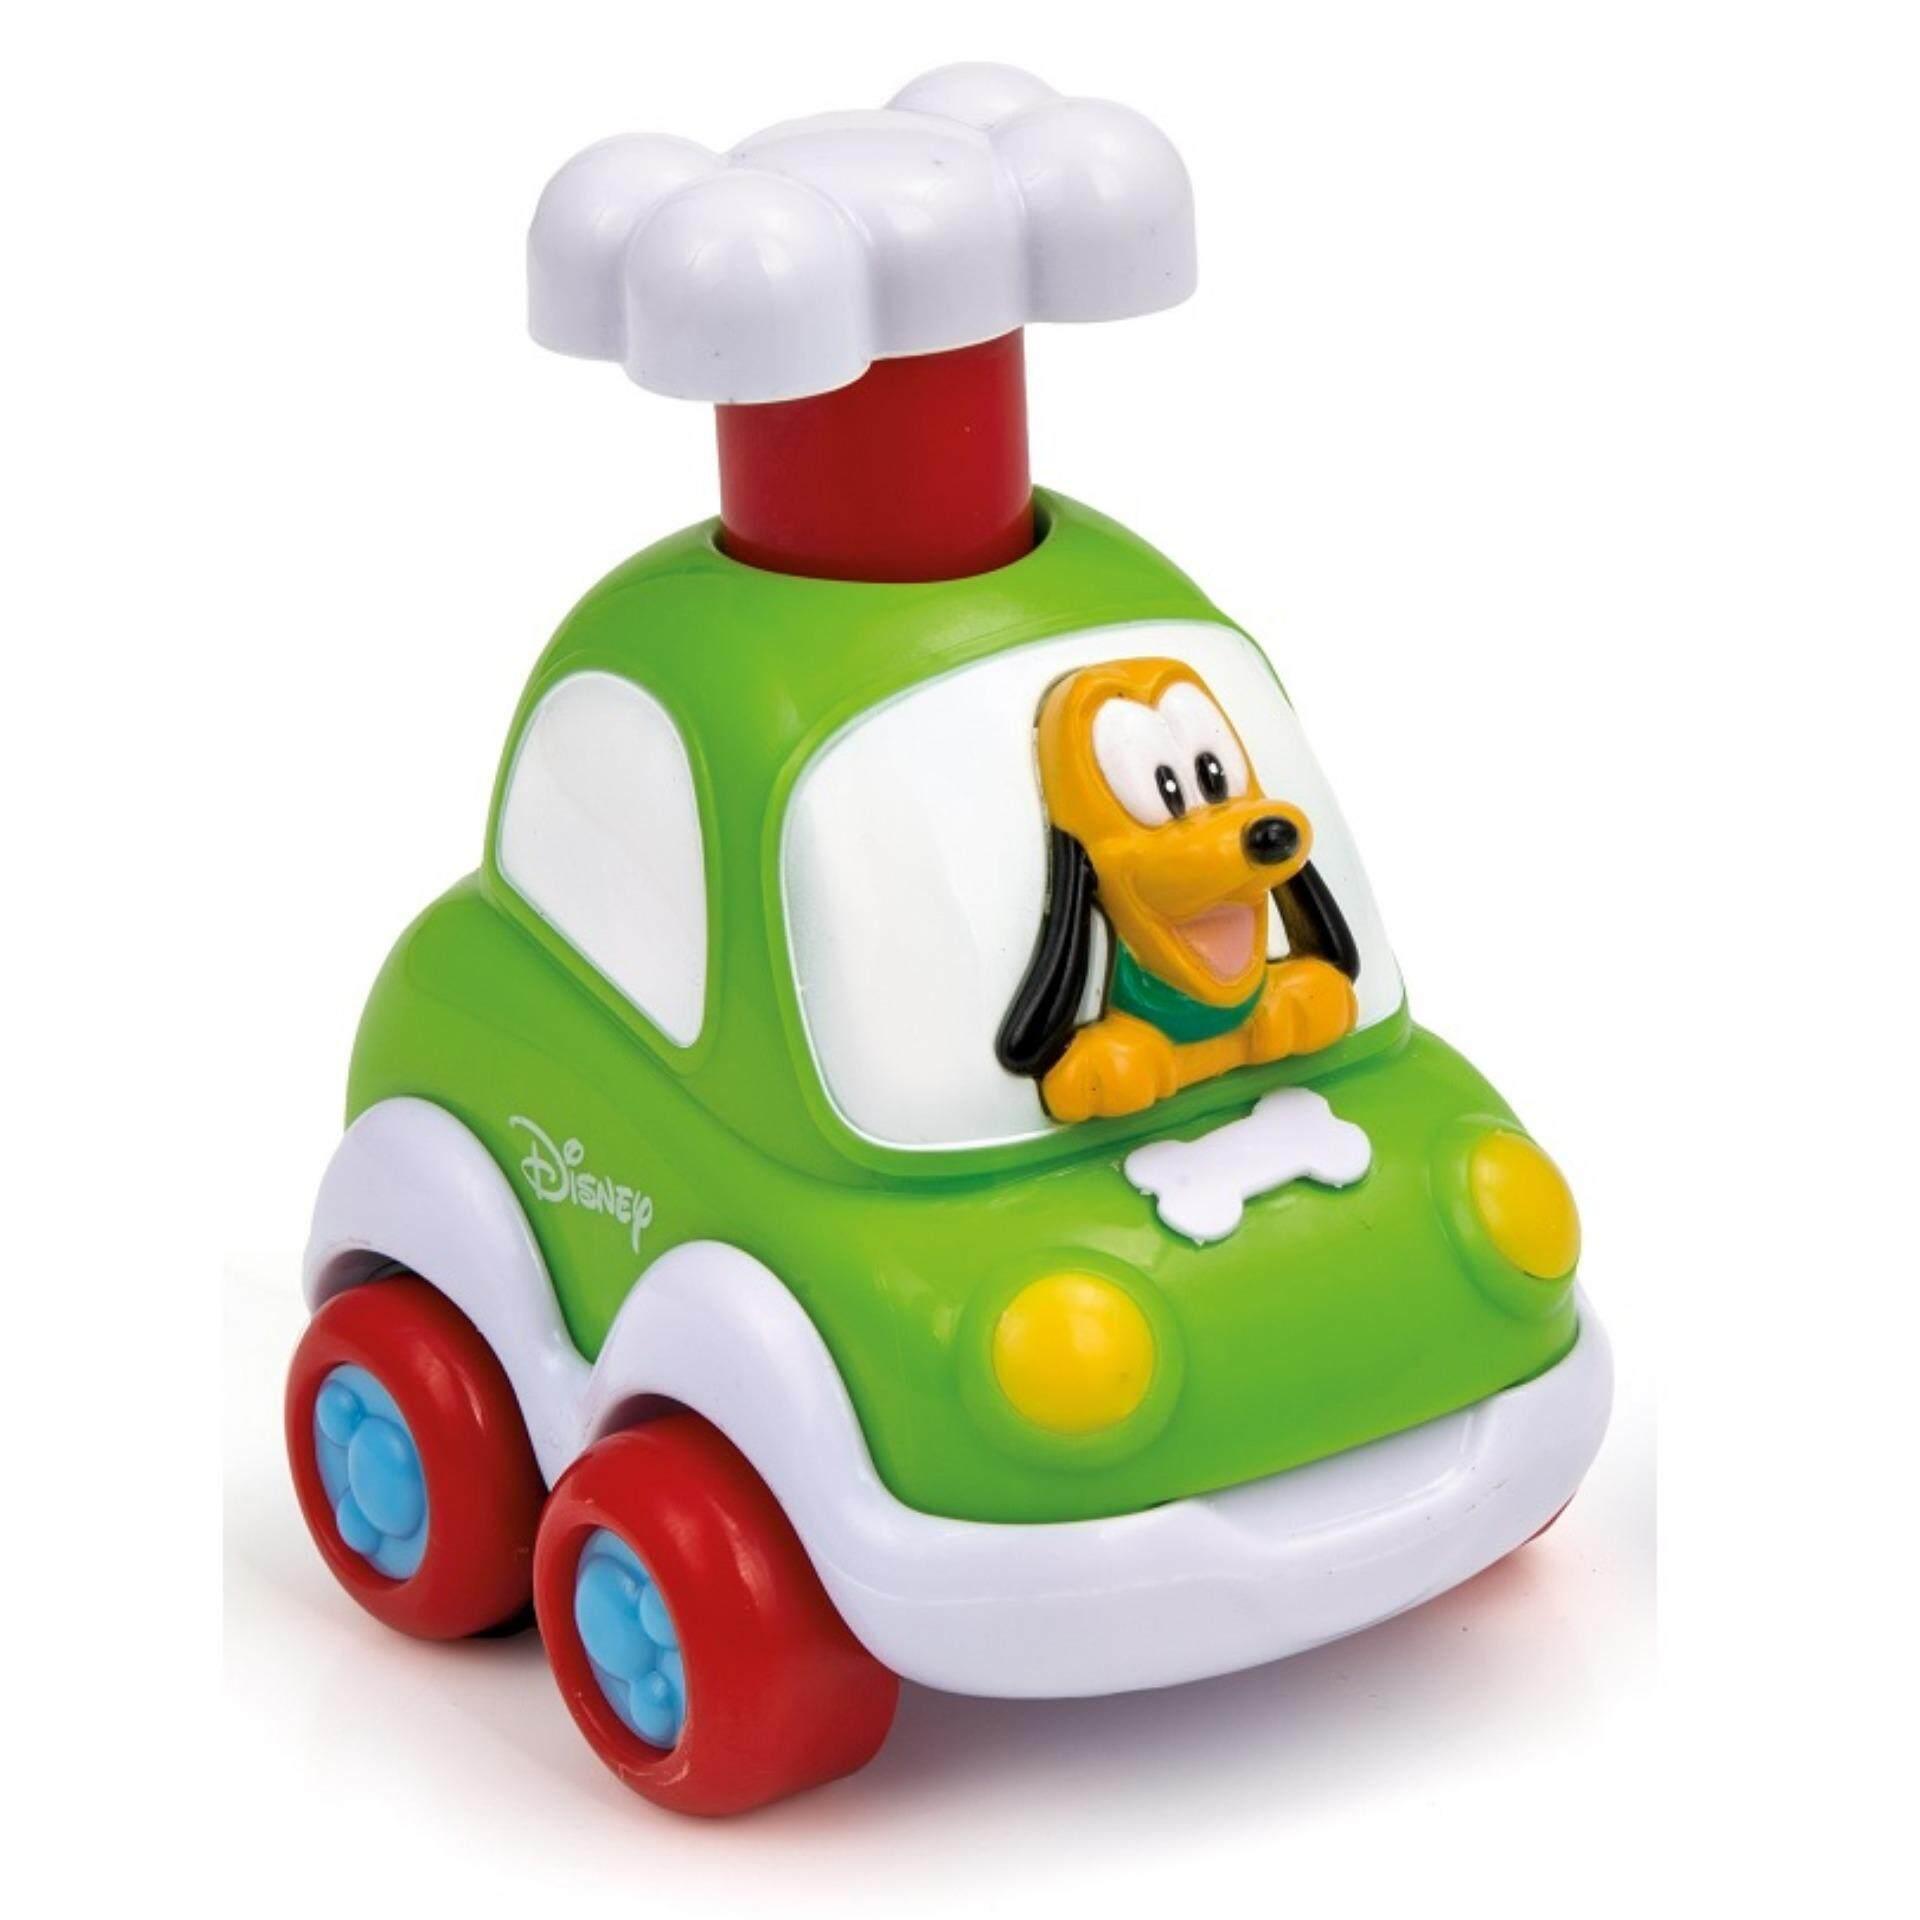 Disney Baby Press & Go Cars Toys - Pluto baby toys